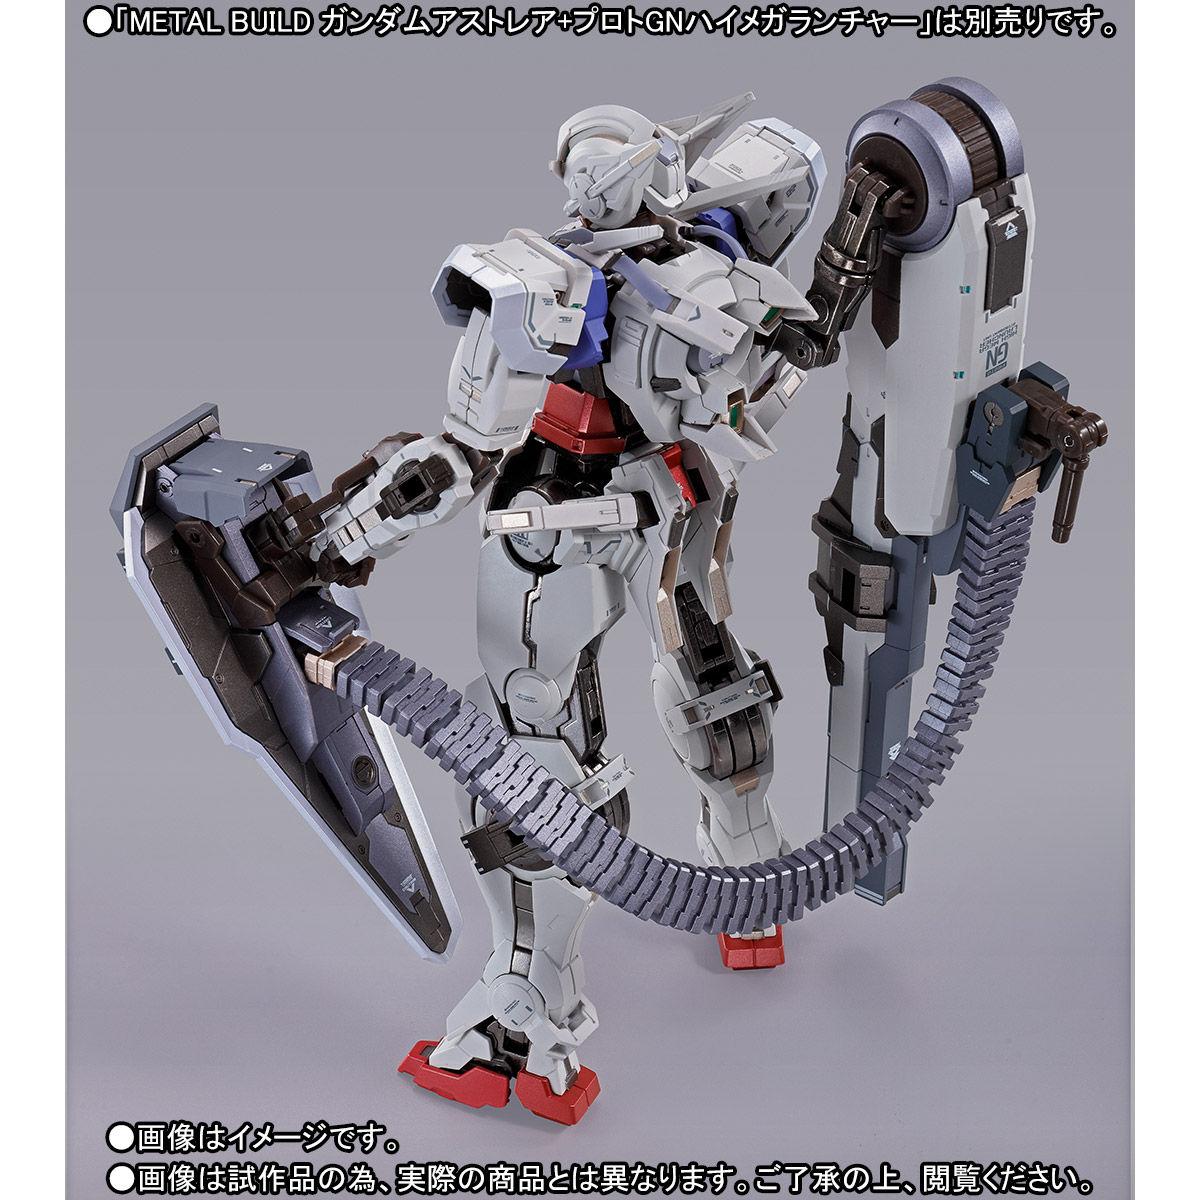 METAL BUILD『ガンダムアストレア用高機動試験装備』機動戦士ガンダム00P 可動フィギュア-010